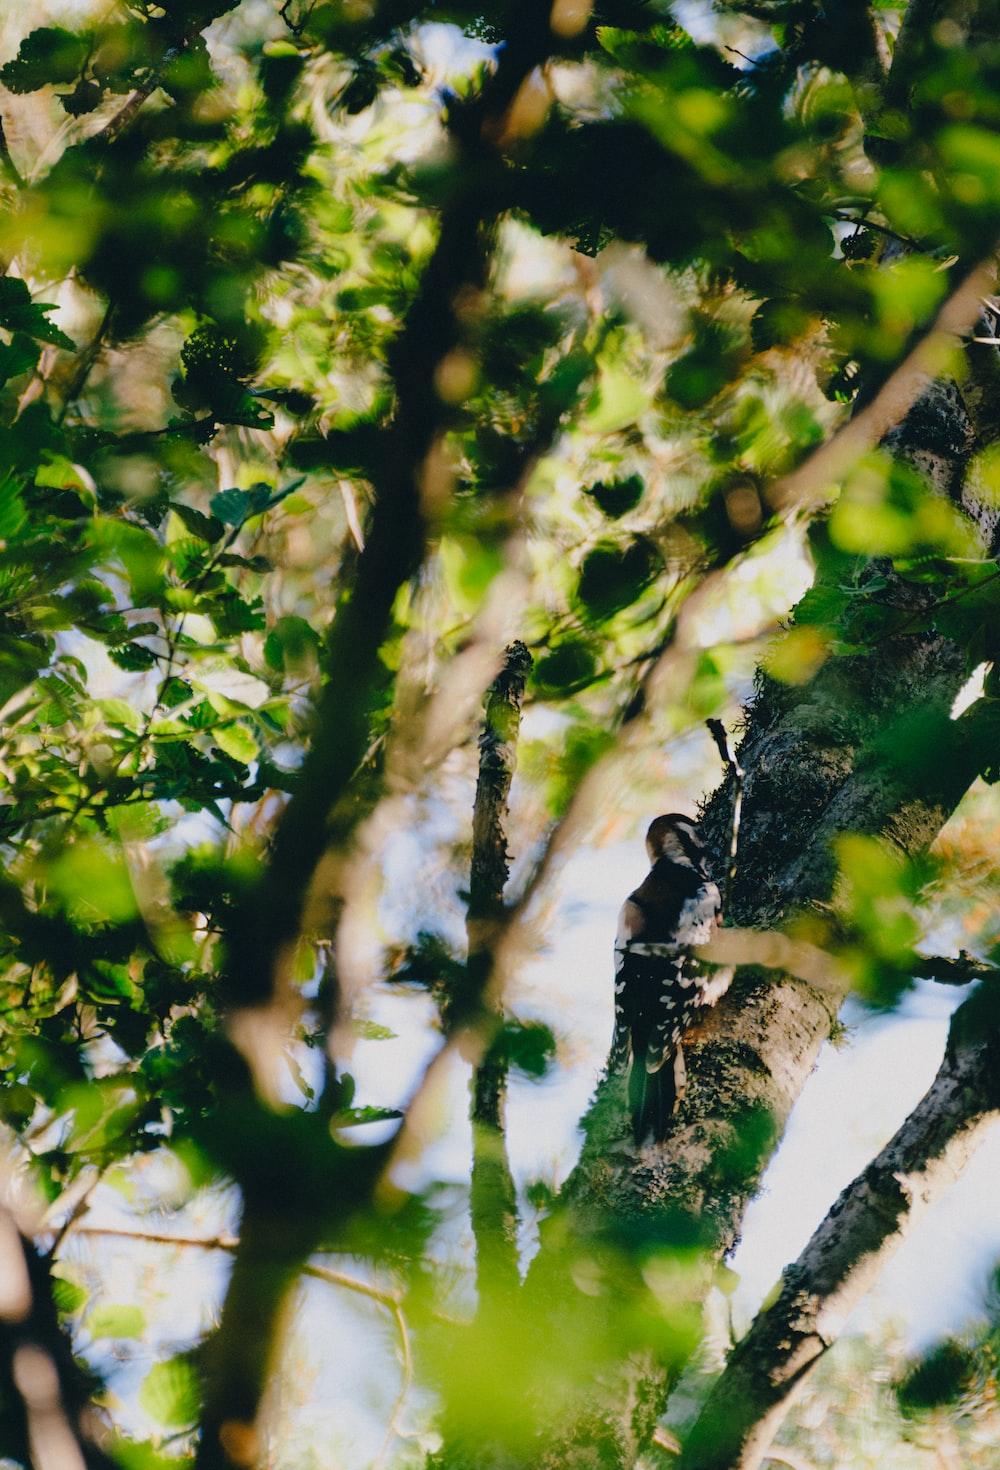 black bird on tree branch during daytime